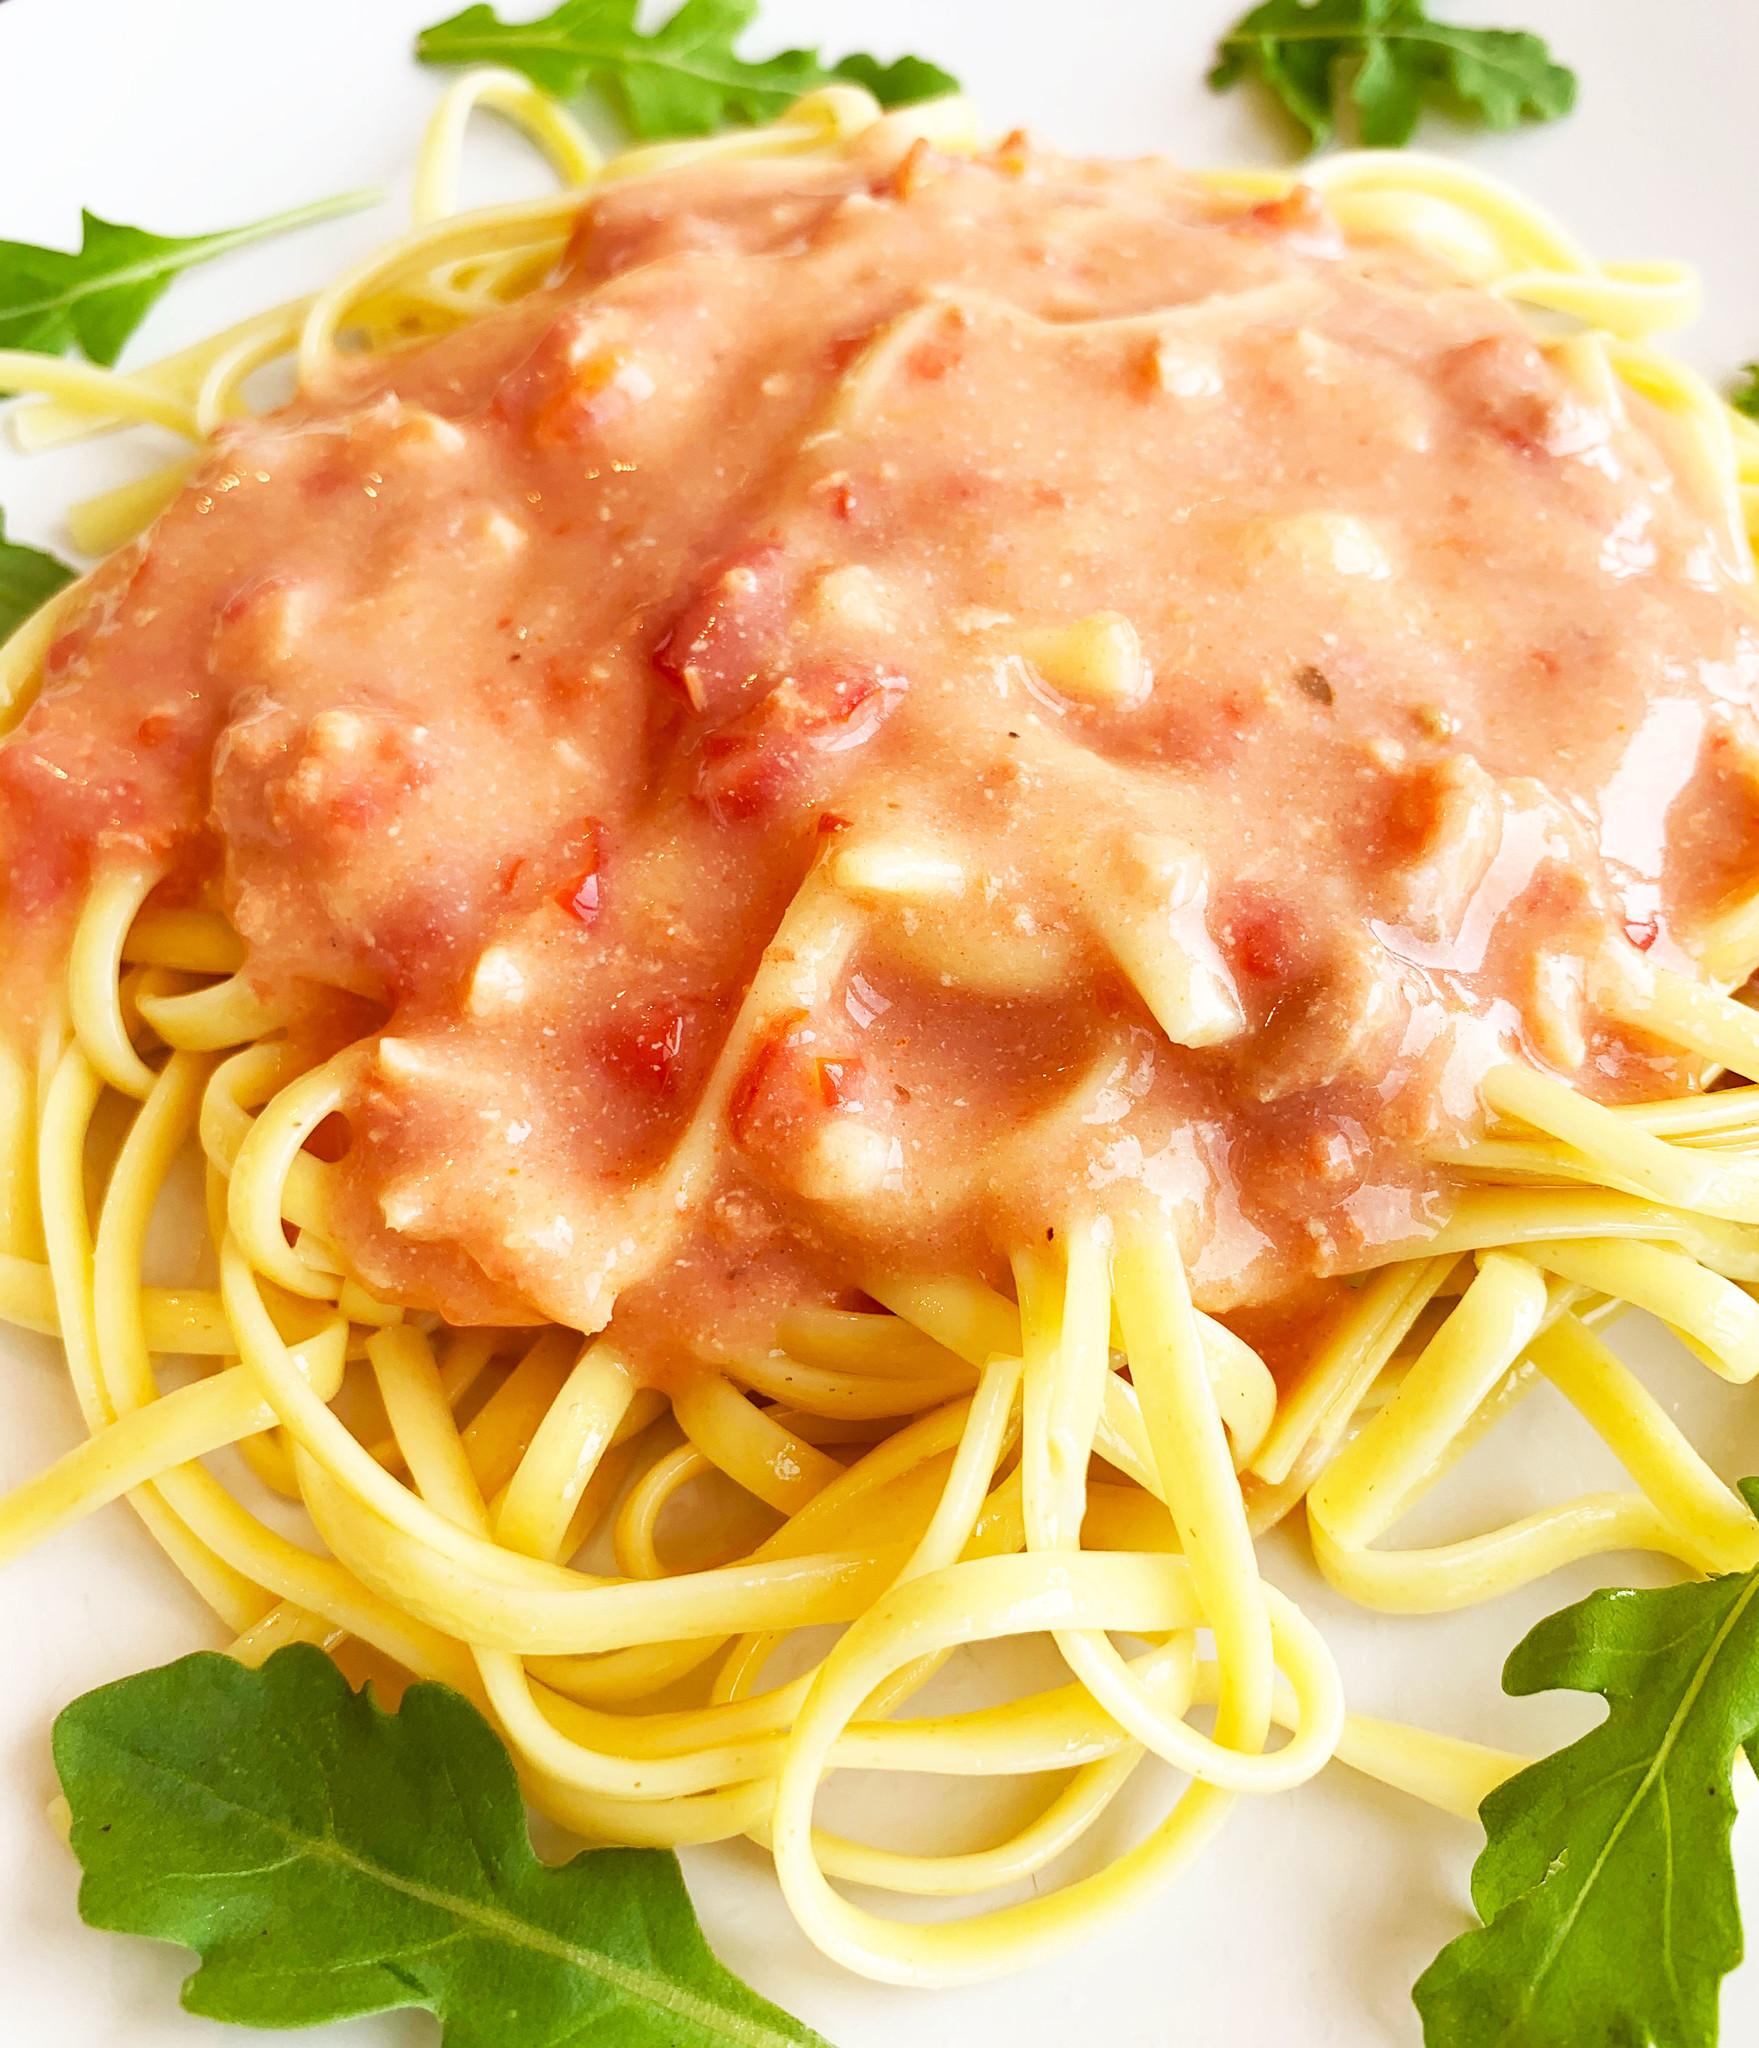 Two-salmon linguini & pink sauce (175g)